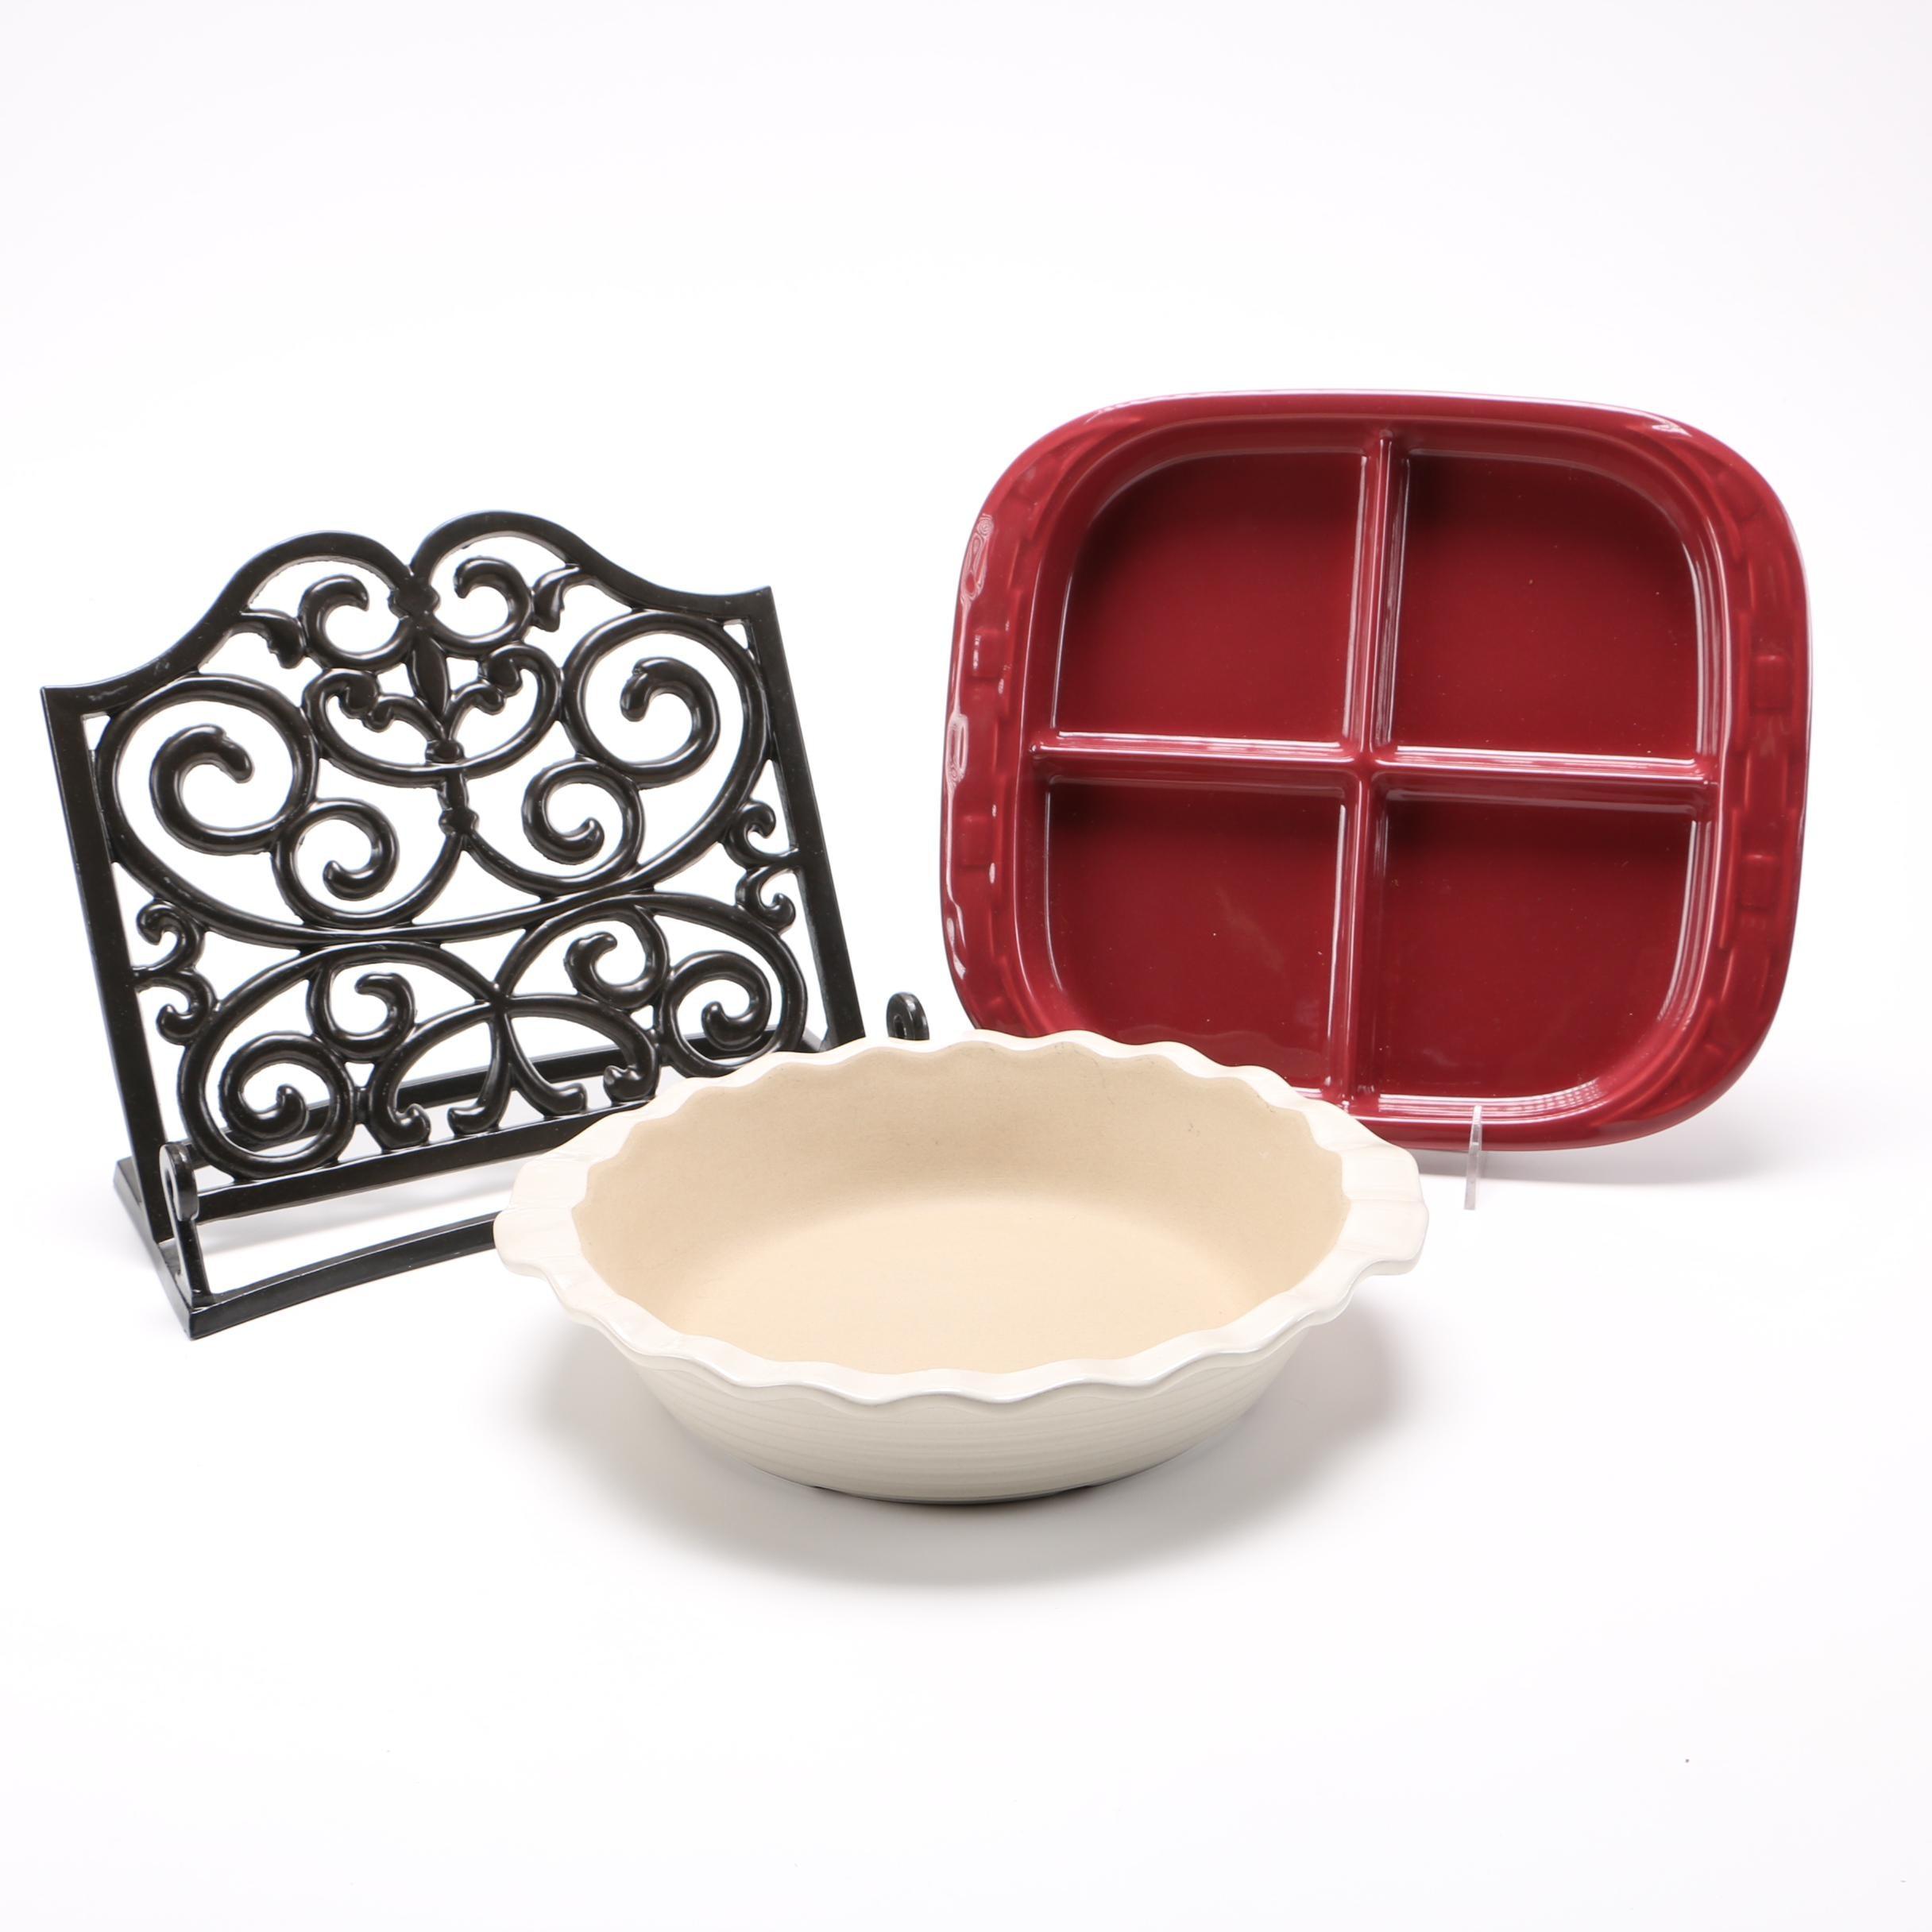 Metal Cookbook Holder and Assorted Cookware Including Longaberger